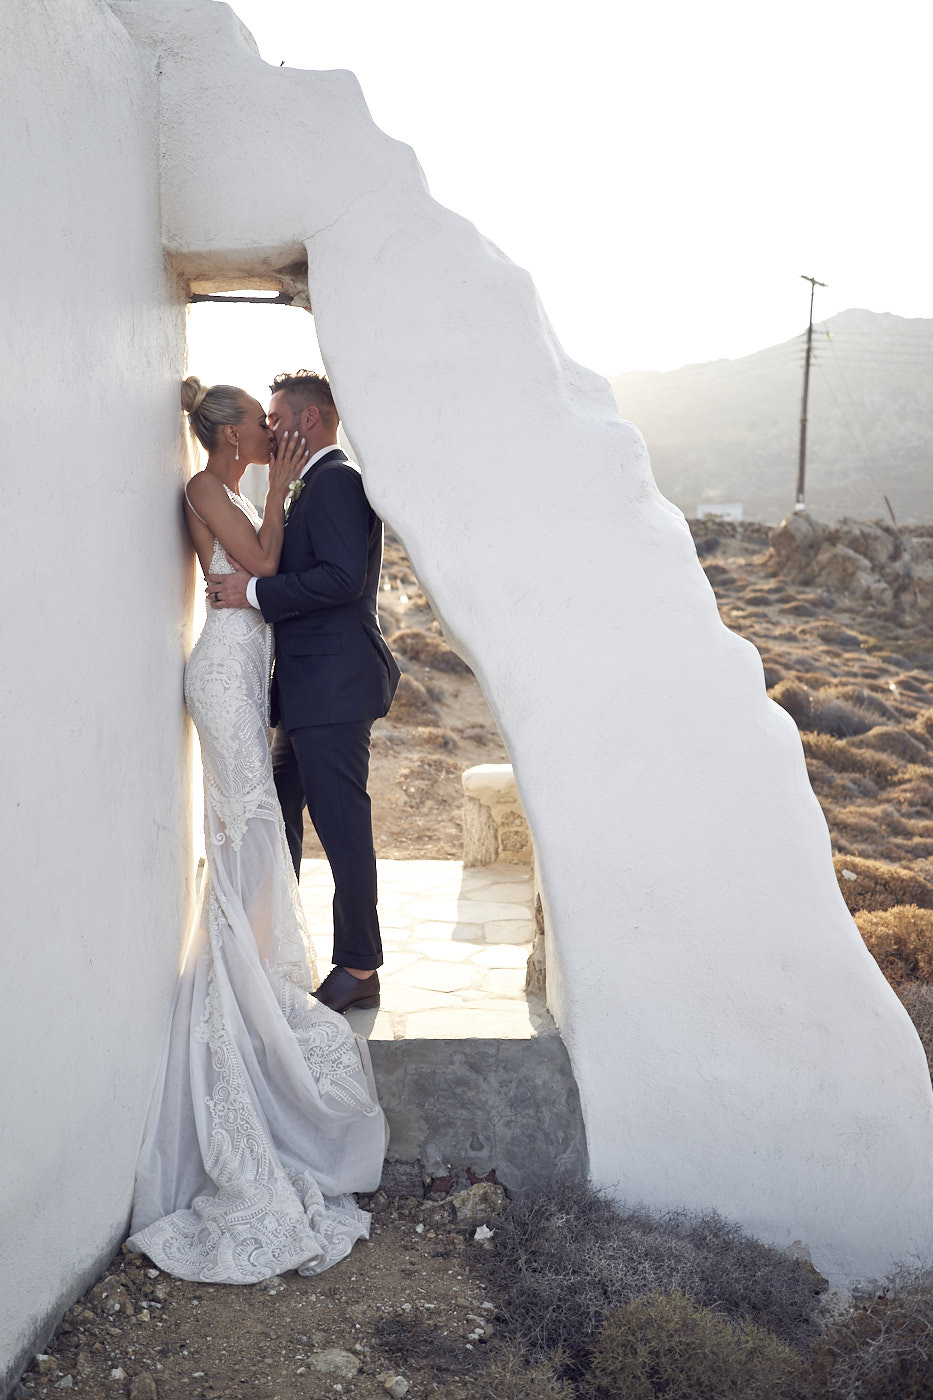 MandN_Mykonos-wedding_Lostinlove 4.JPG